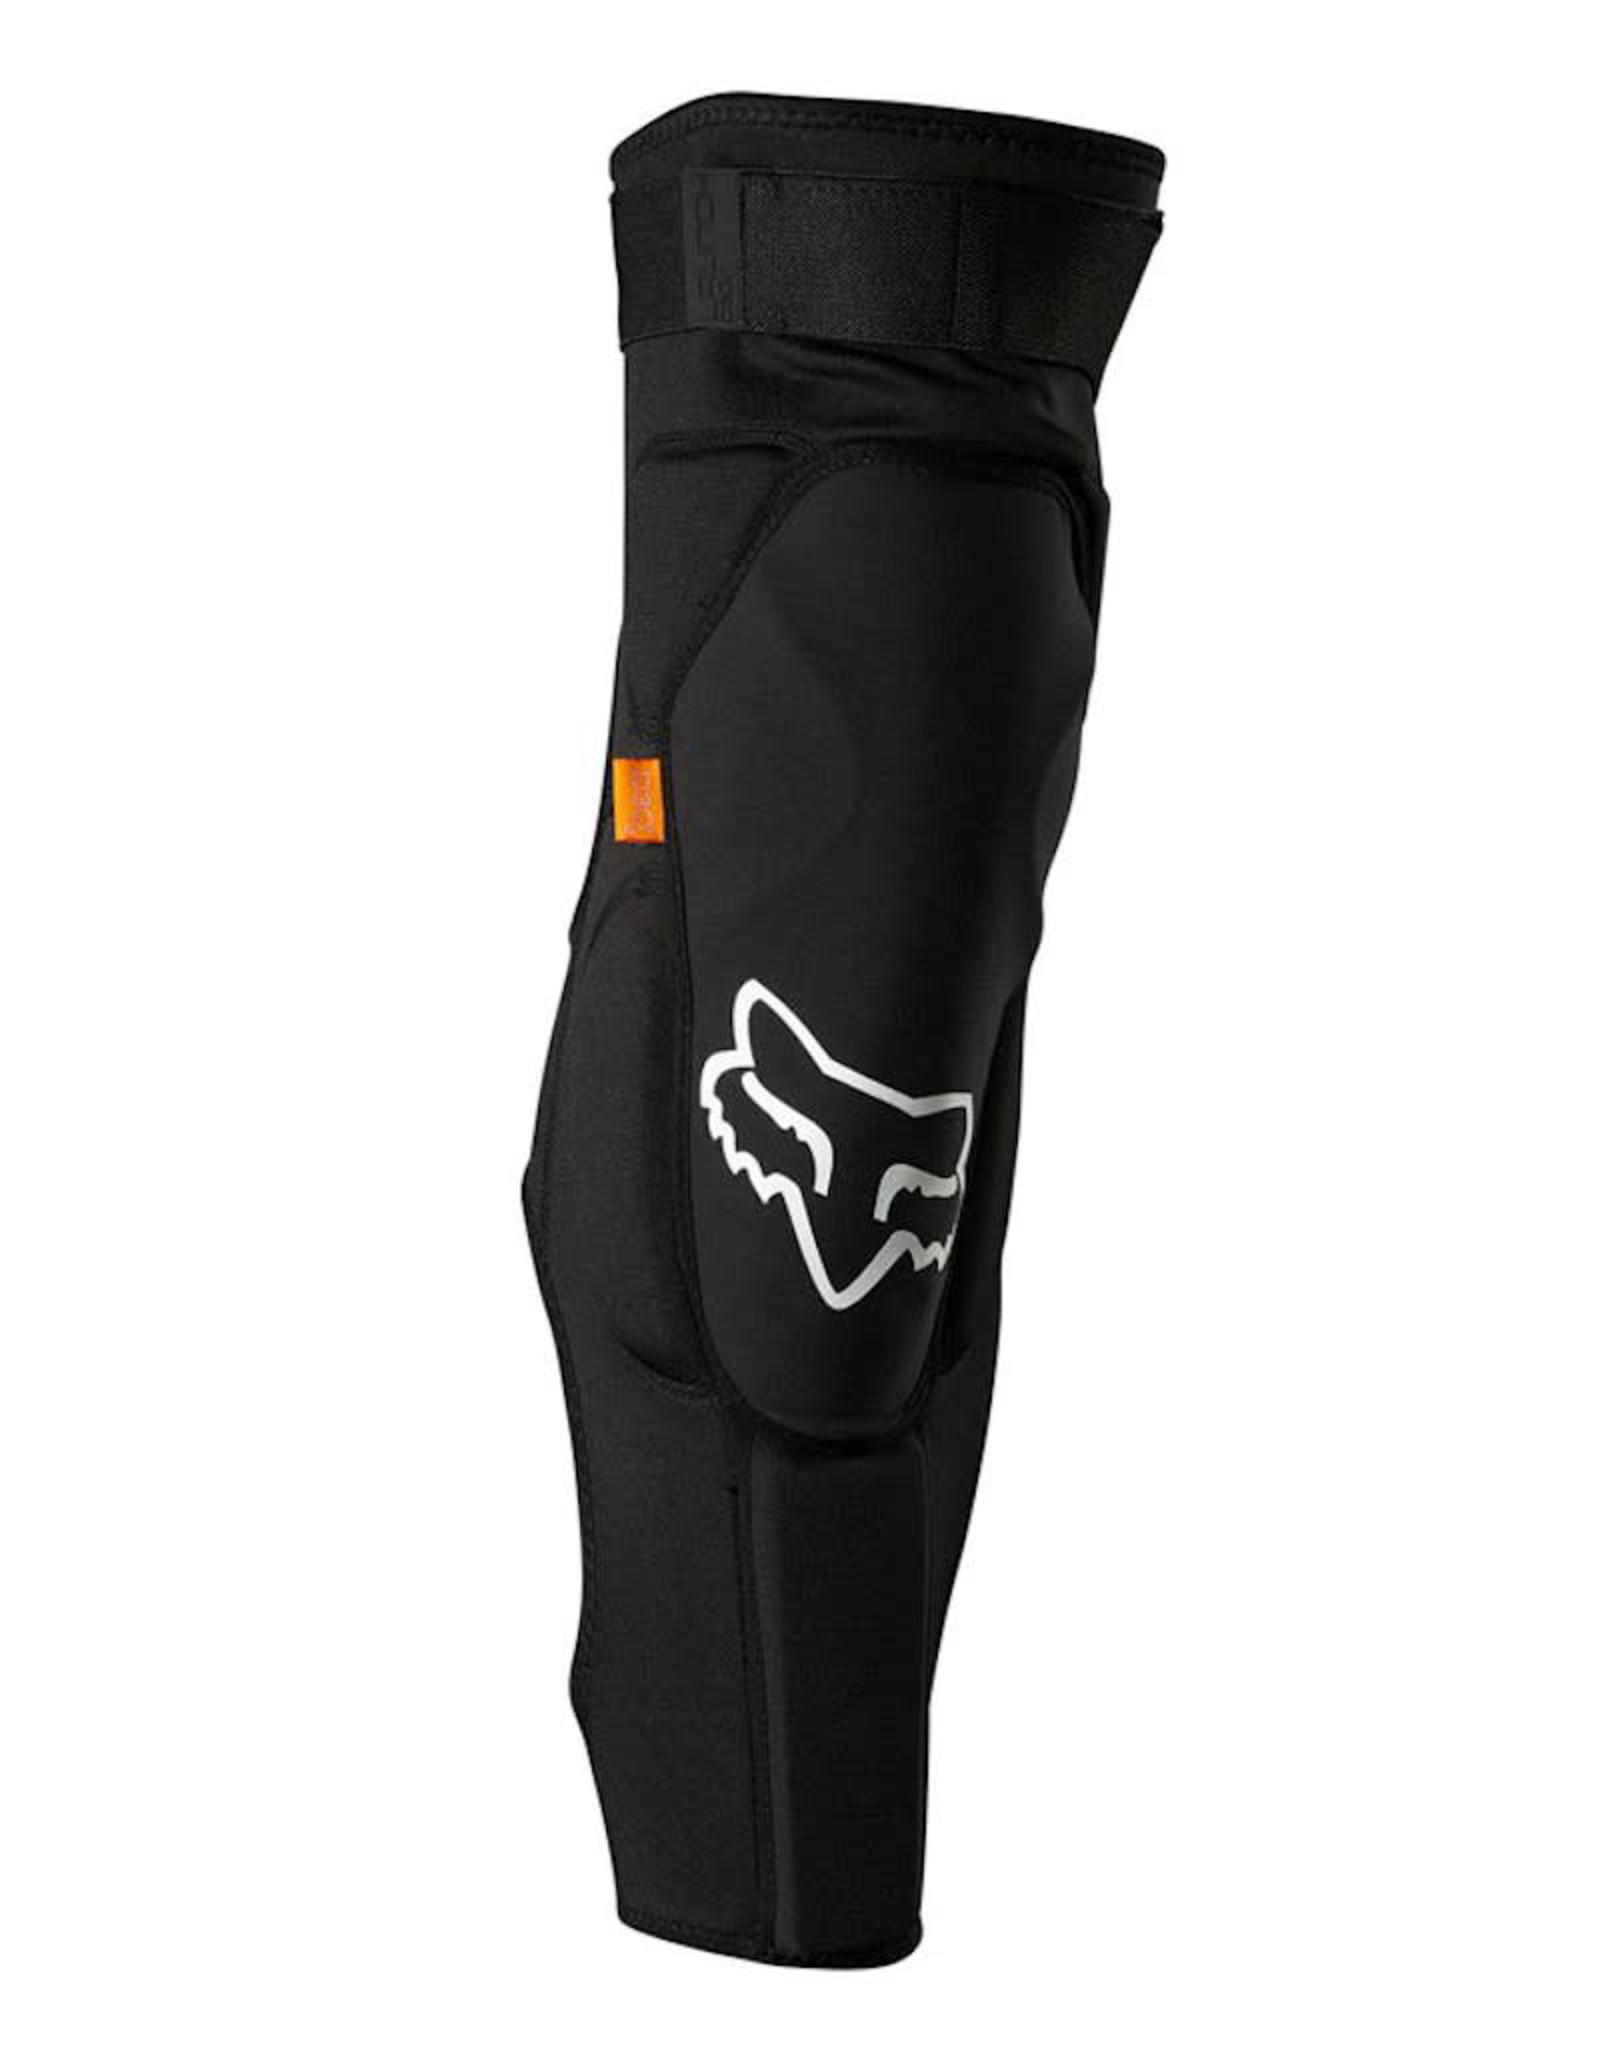 Fox Head Fox - Protège-tibias / genoux Launch Pro D30